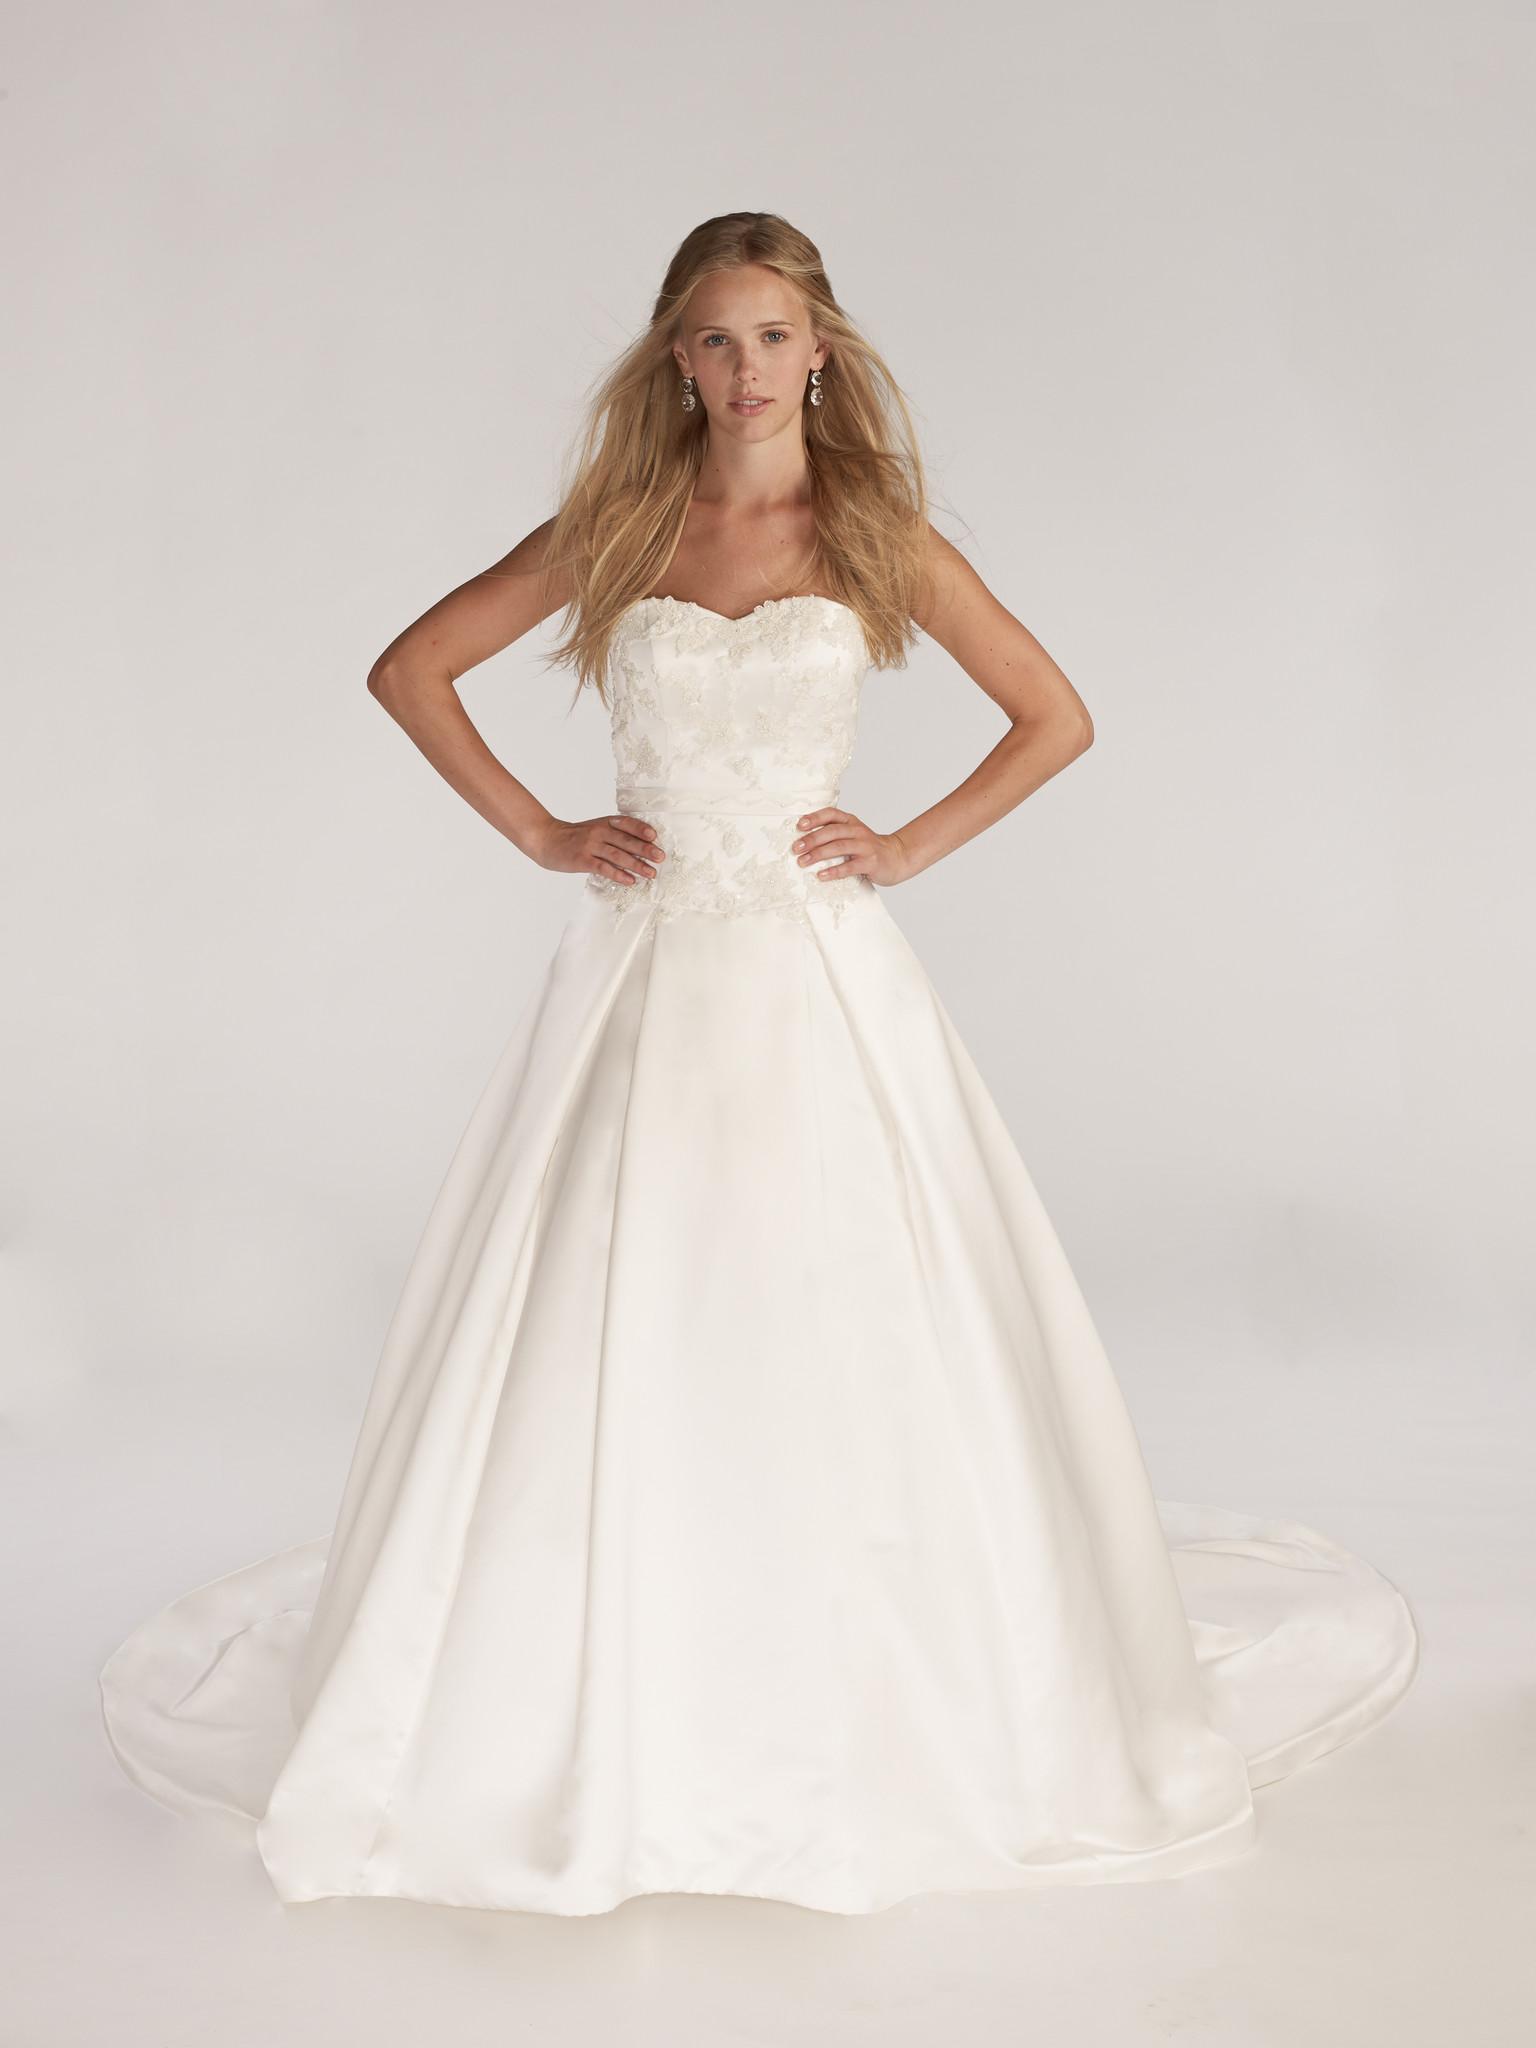 kirstie kelly wedding dresses photo - 1